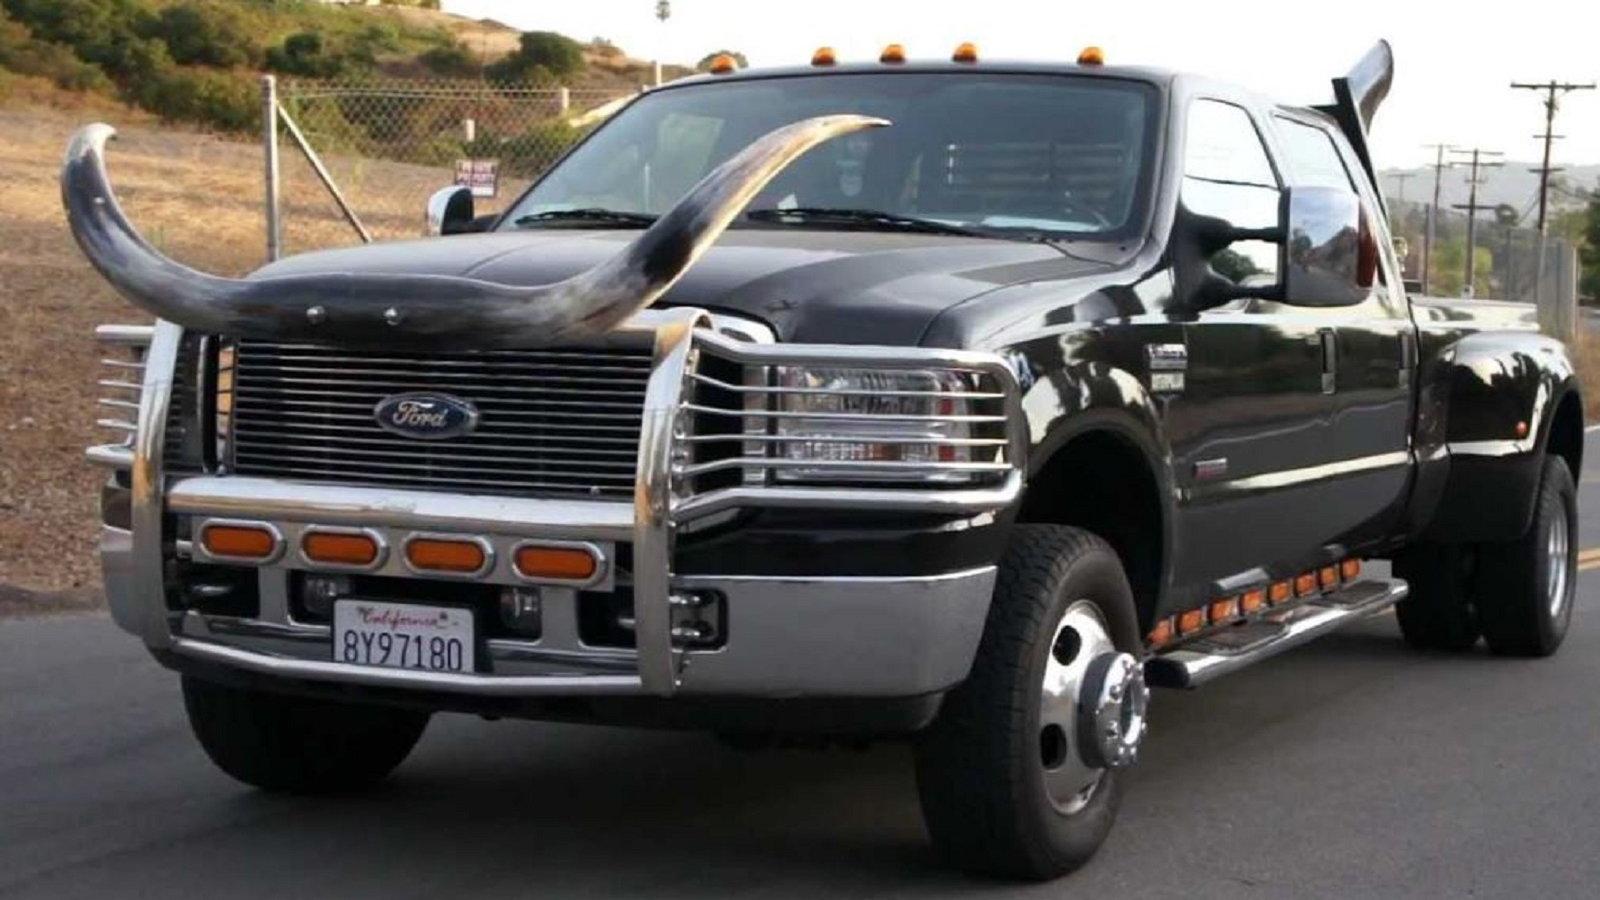 Texans Love Them Diesels!